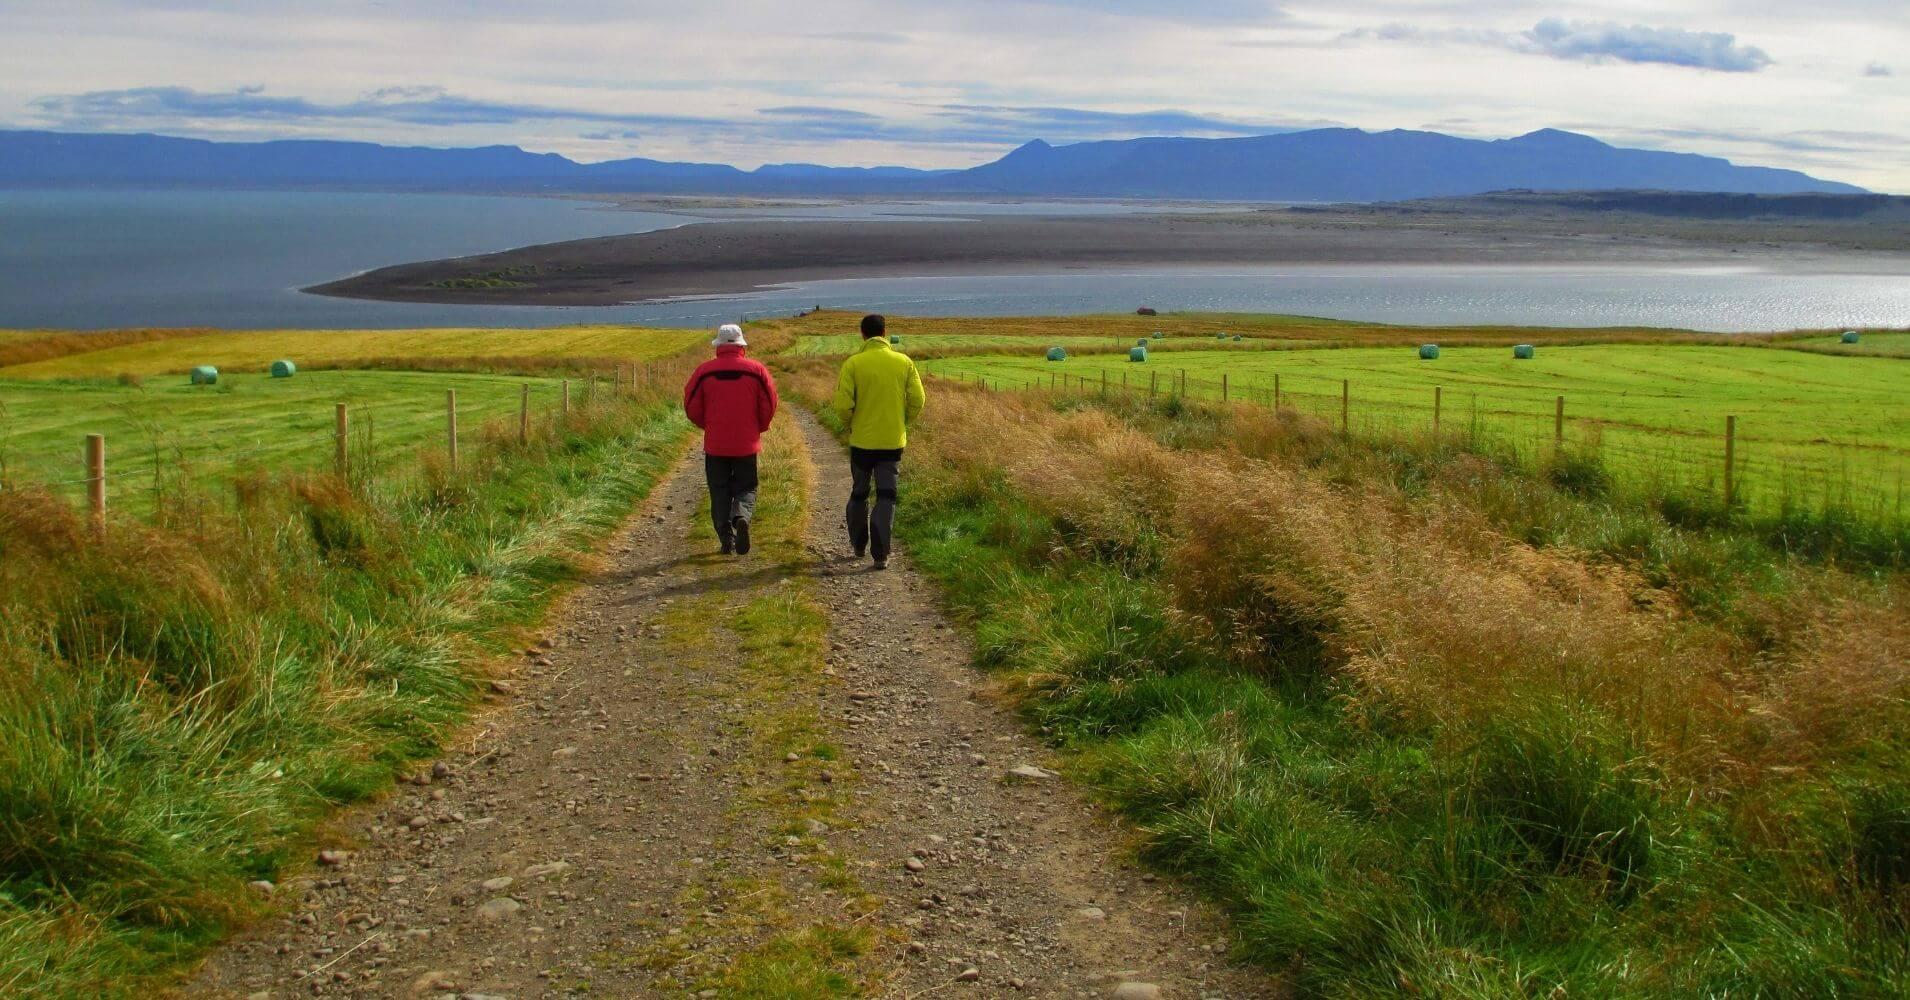 Paseo por Hvammstangi. Norðurland Vestra. Islandia.